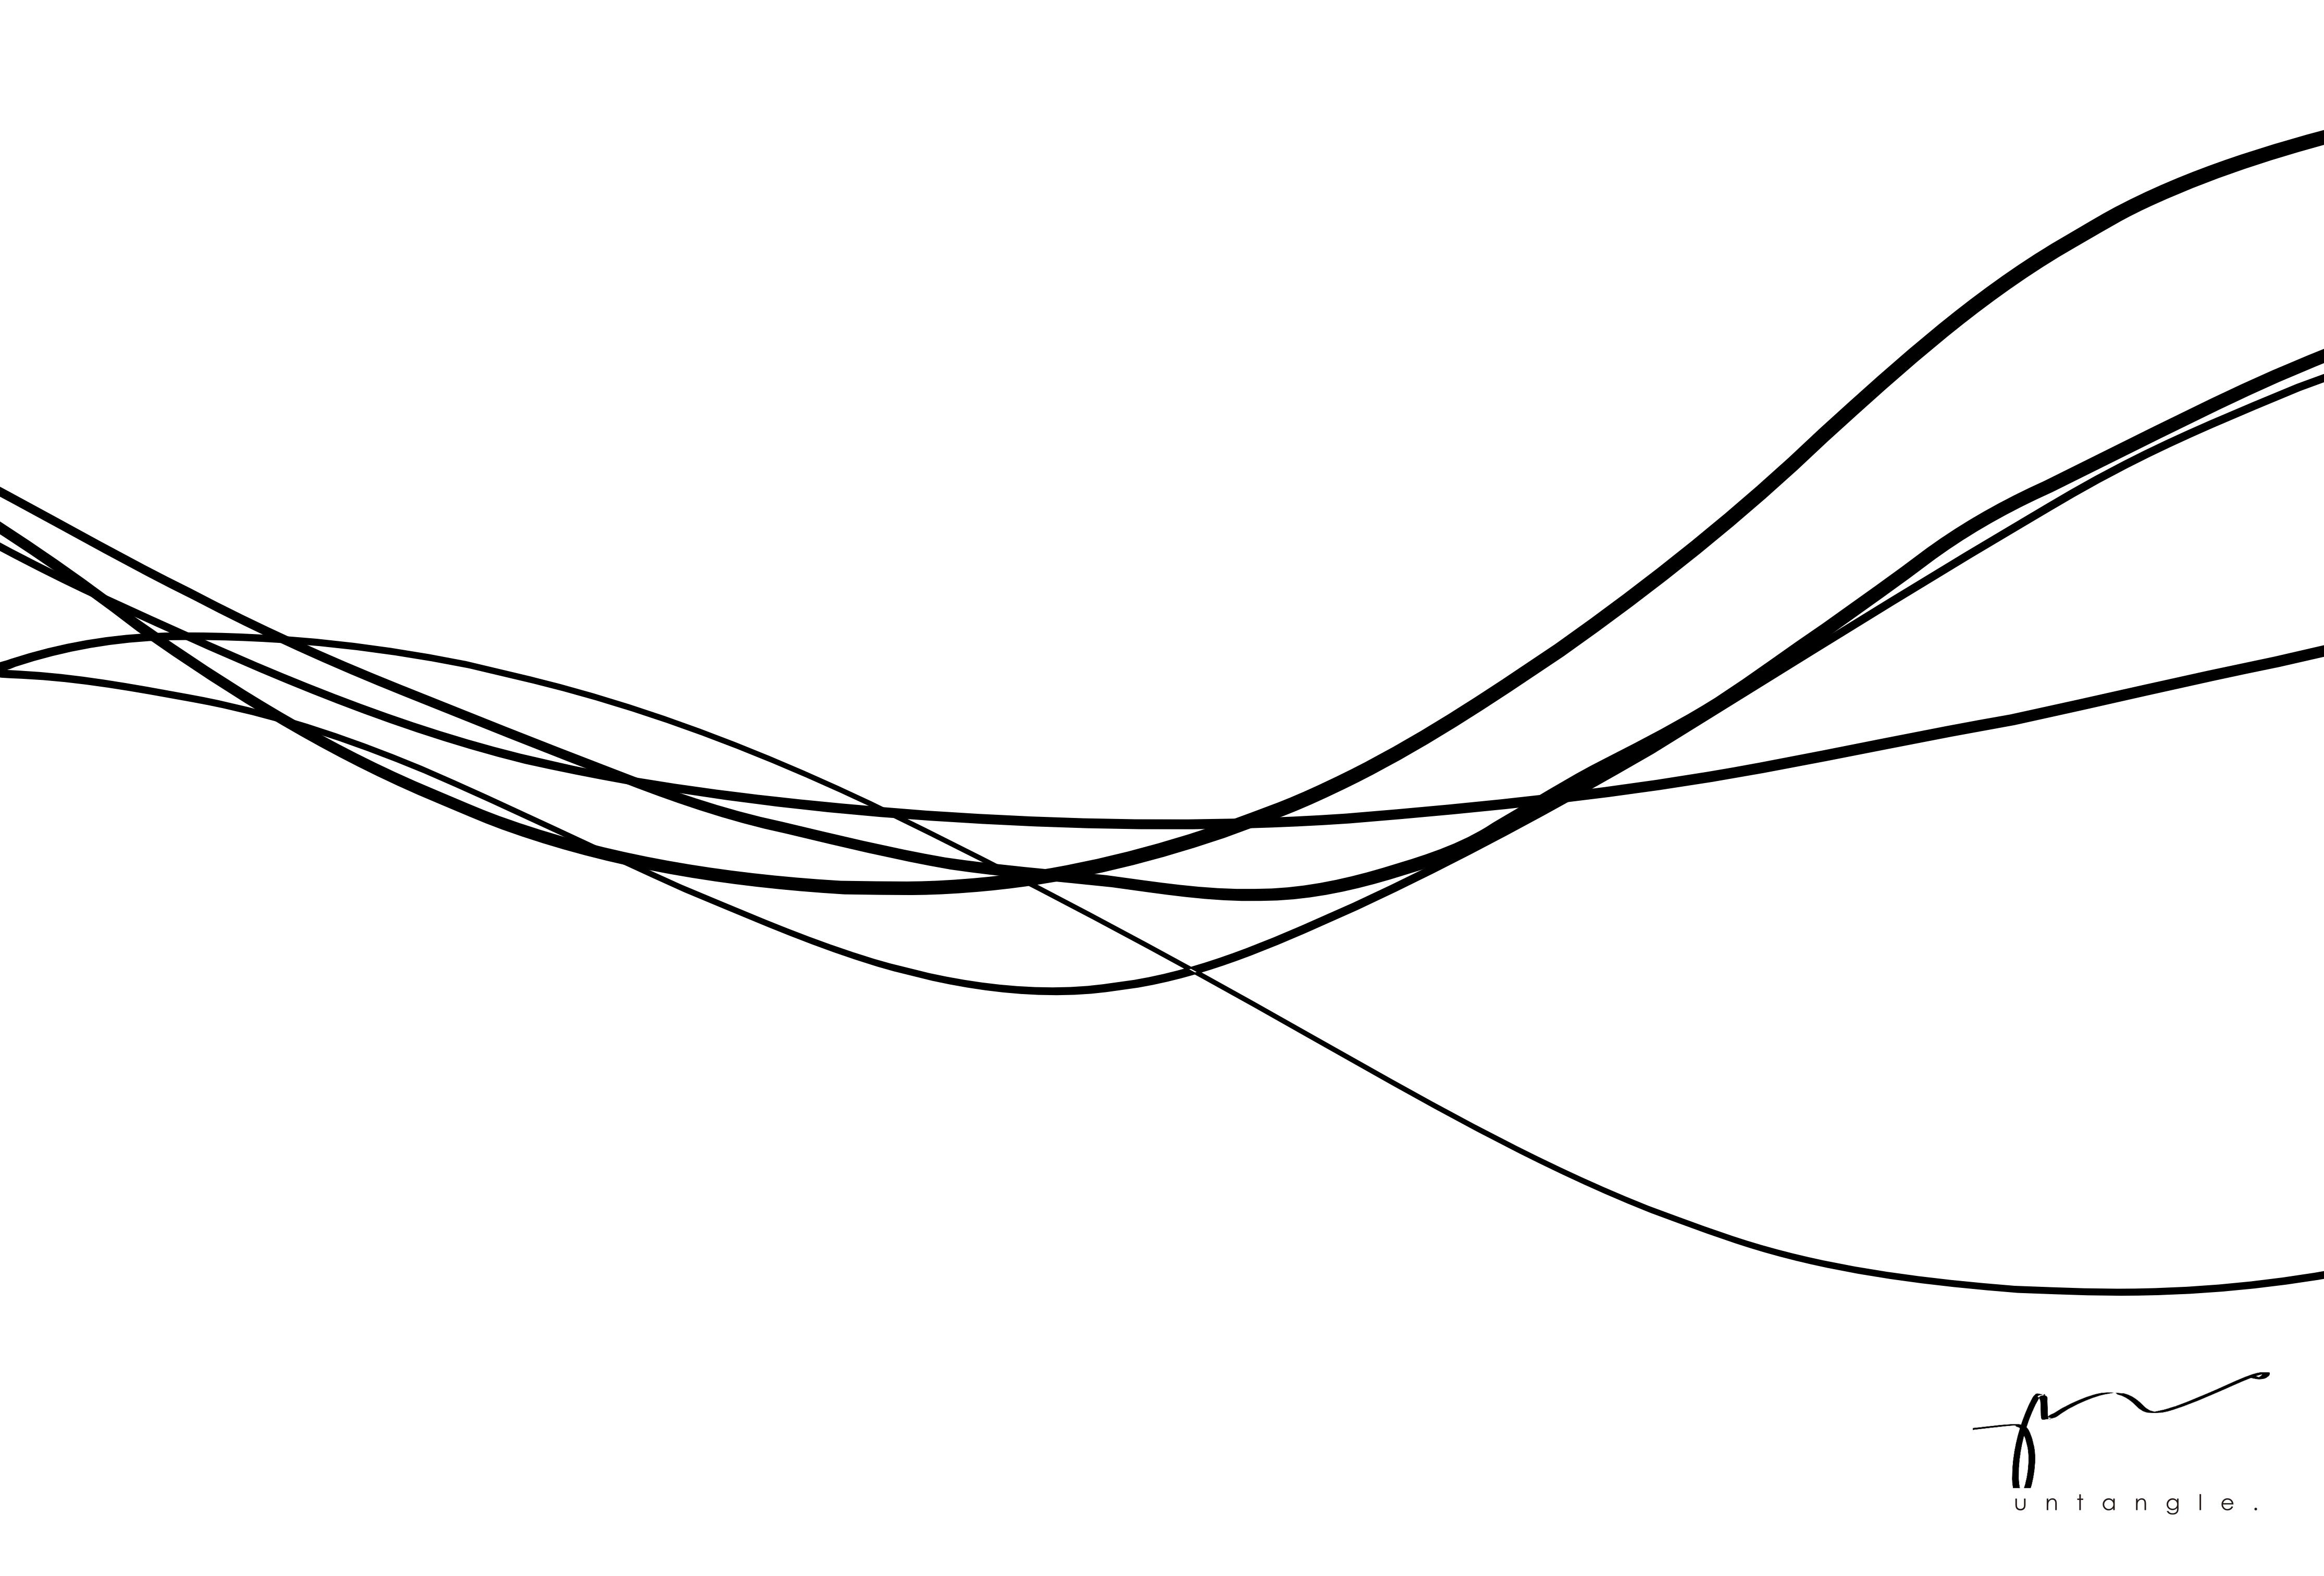 B drawing 01